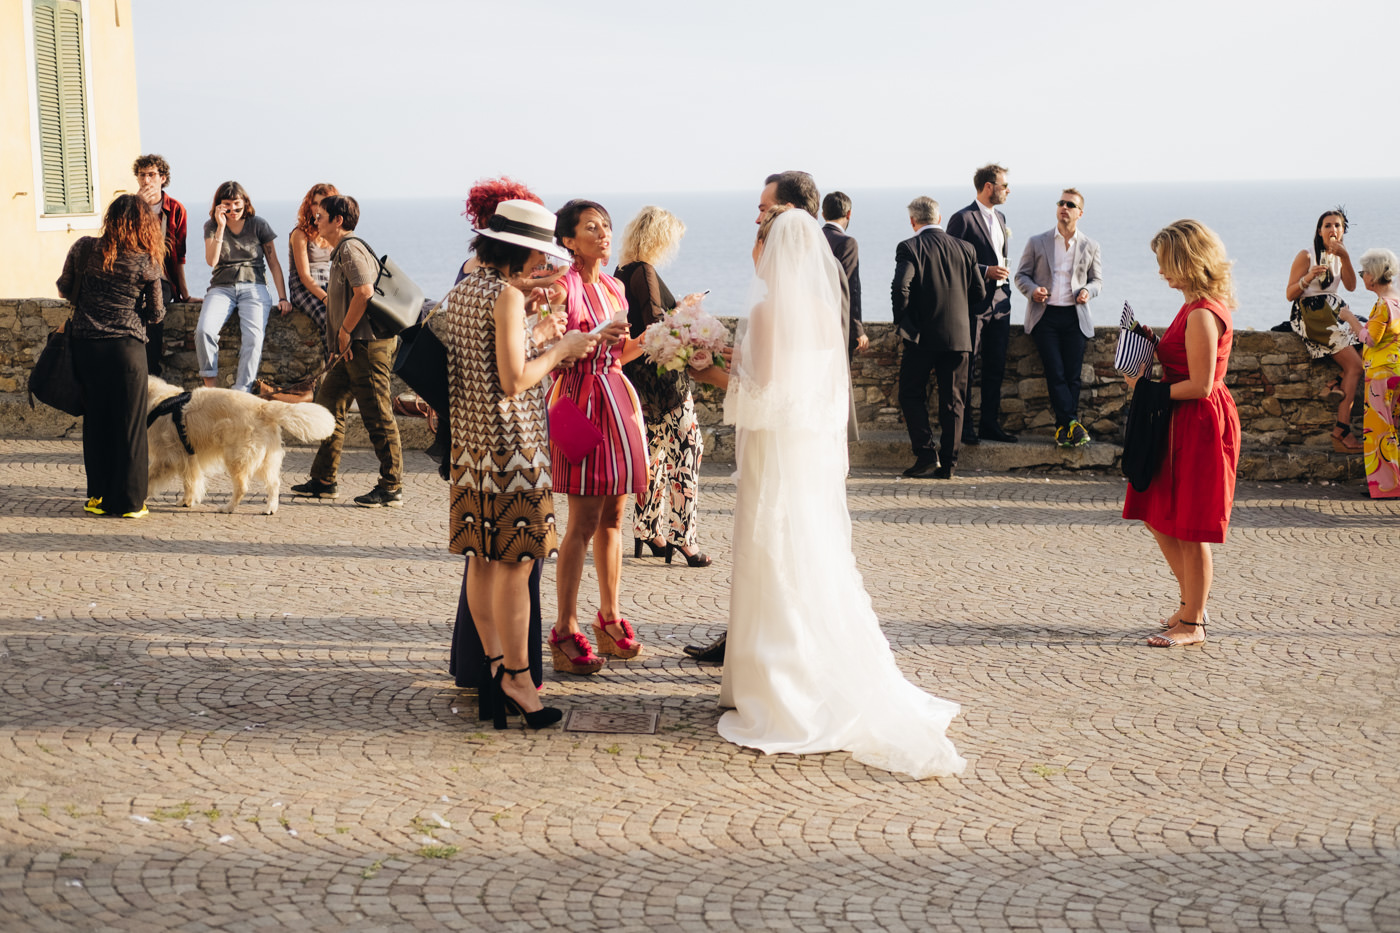 matrimoni_all_italiana_fotografo_matrimonio_cinque_terre-37.jpg